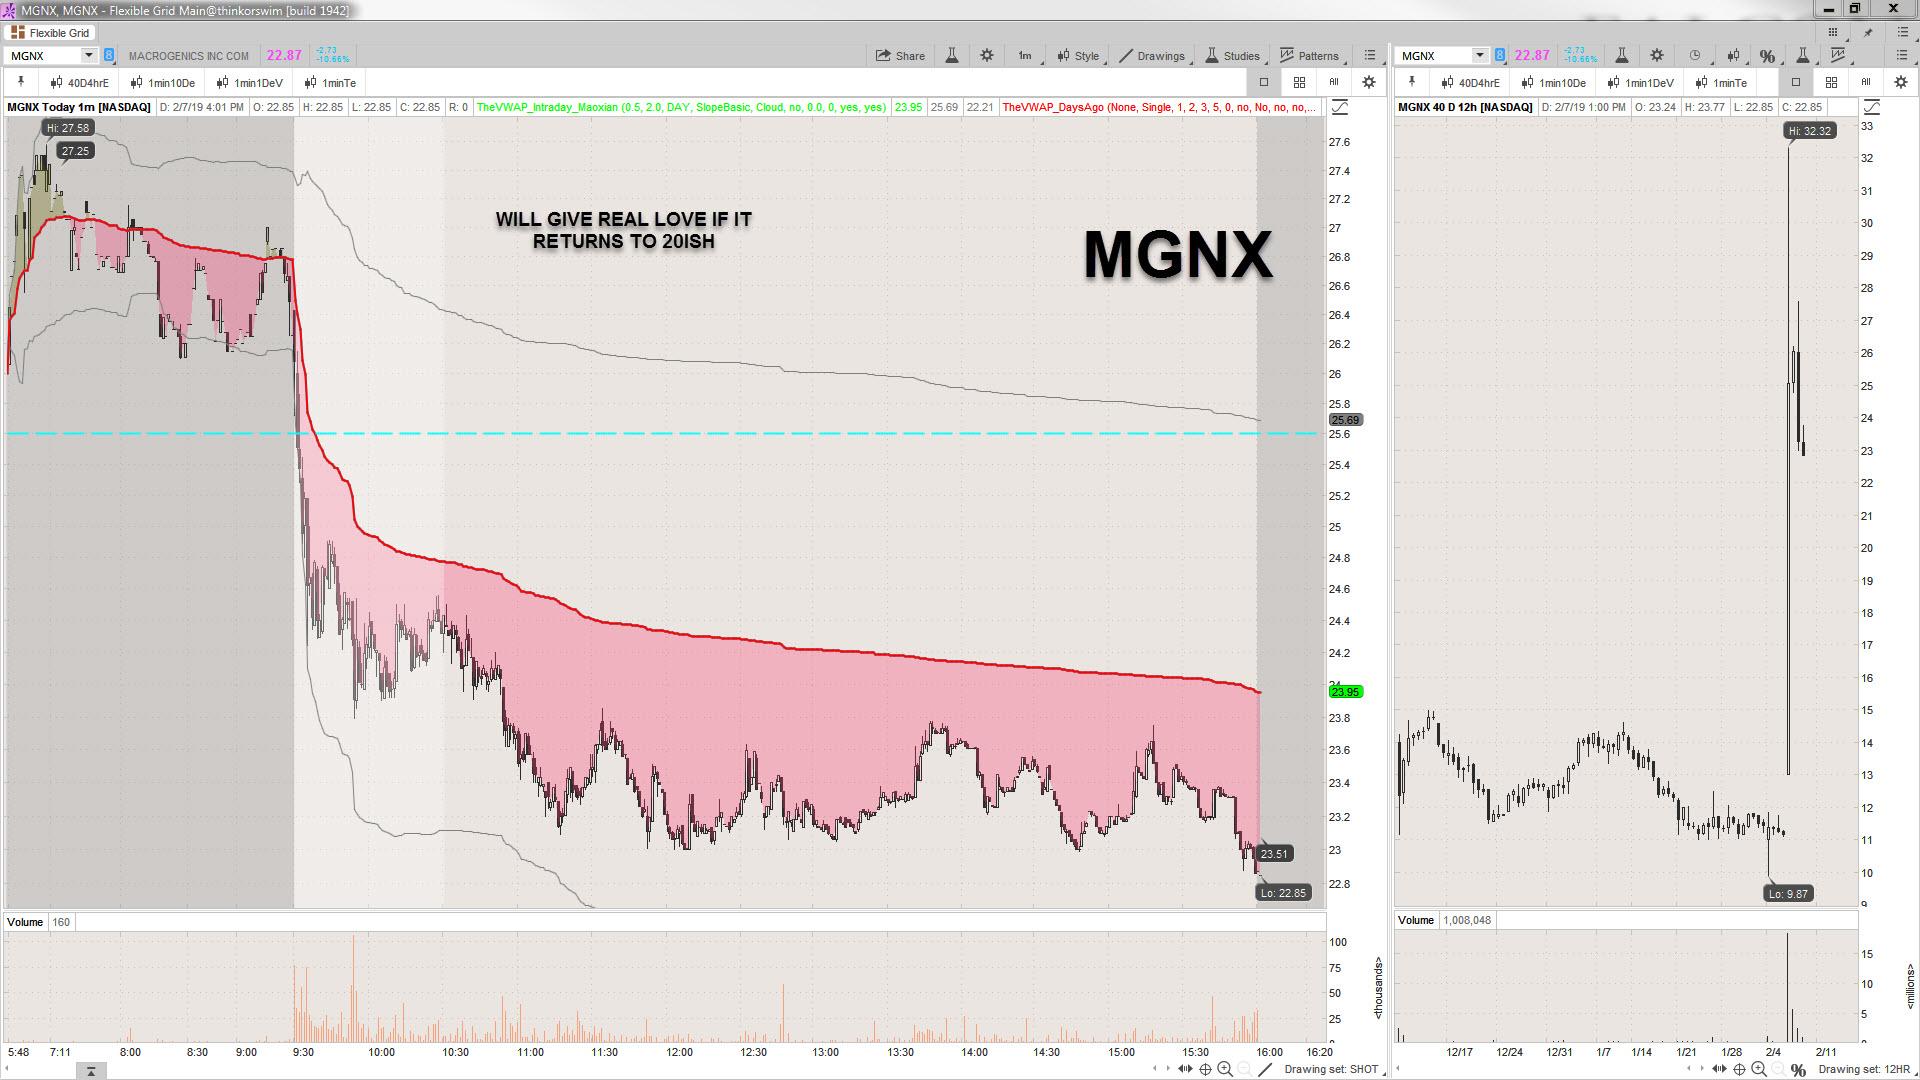 2019-02-07_16-03-50 MGNX.jpg